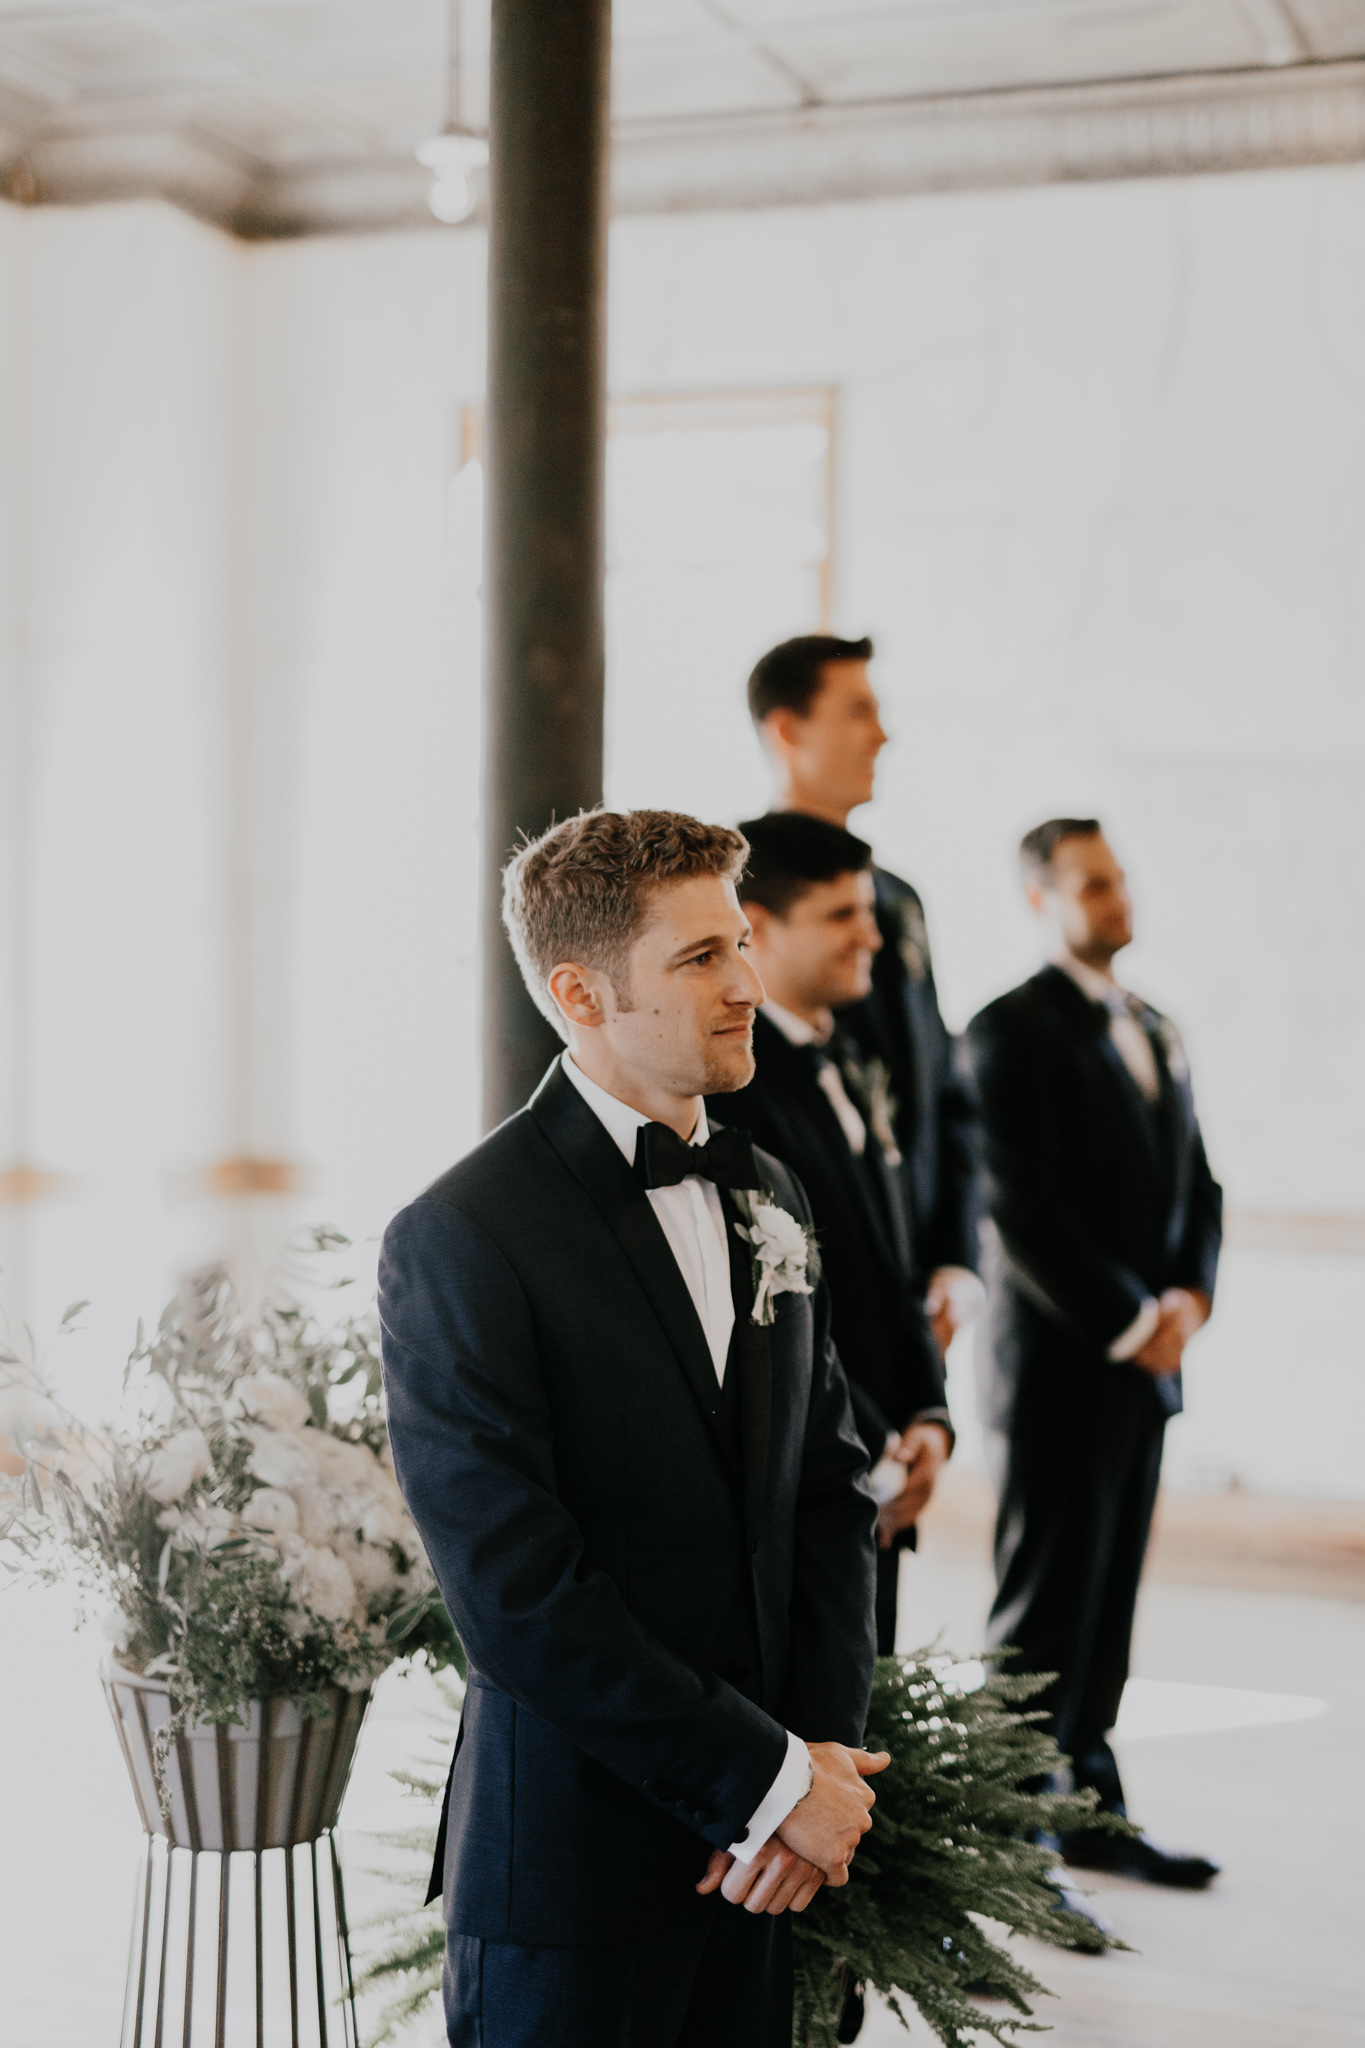 wedding-headlands-center-for-the-arts-sausalito-67.jpg